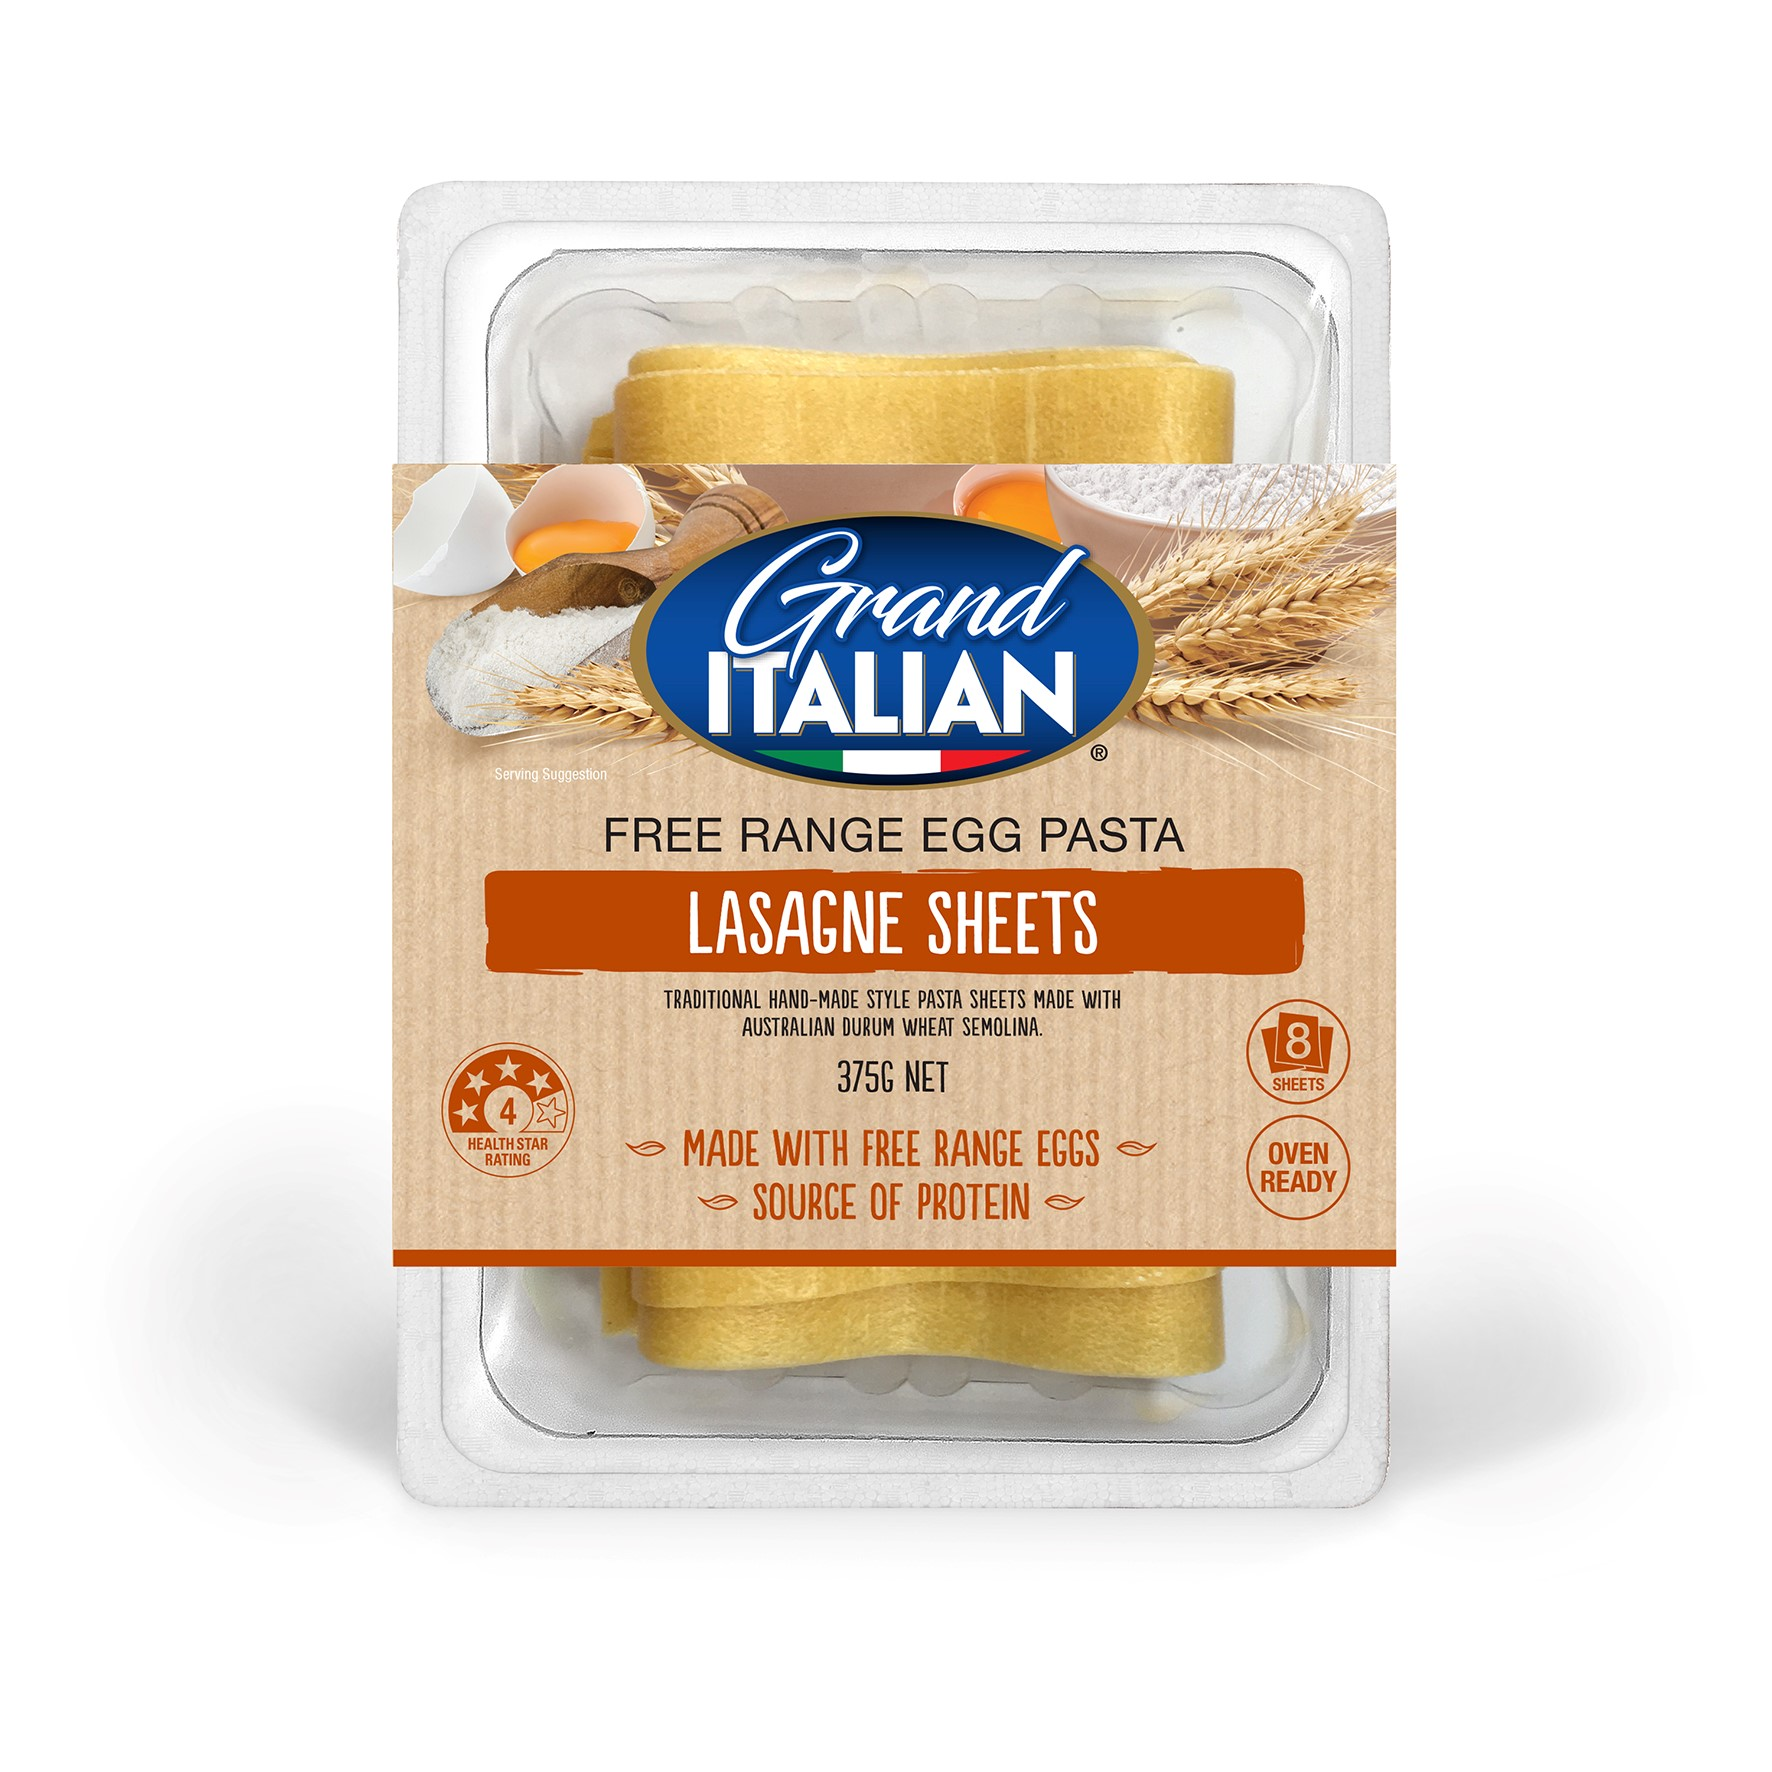 Grand Italian Lasagne Sheets 375g Linerless Concept